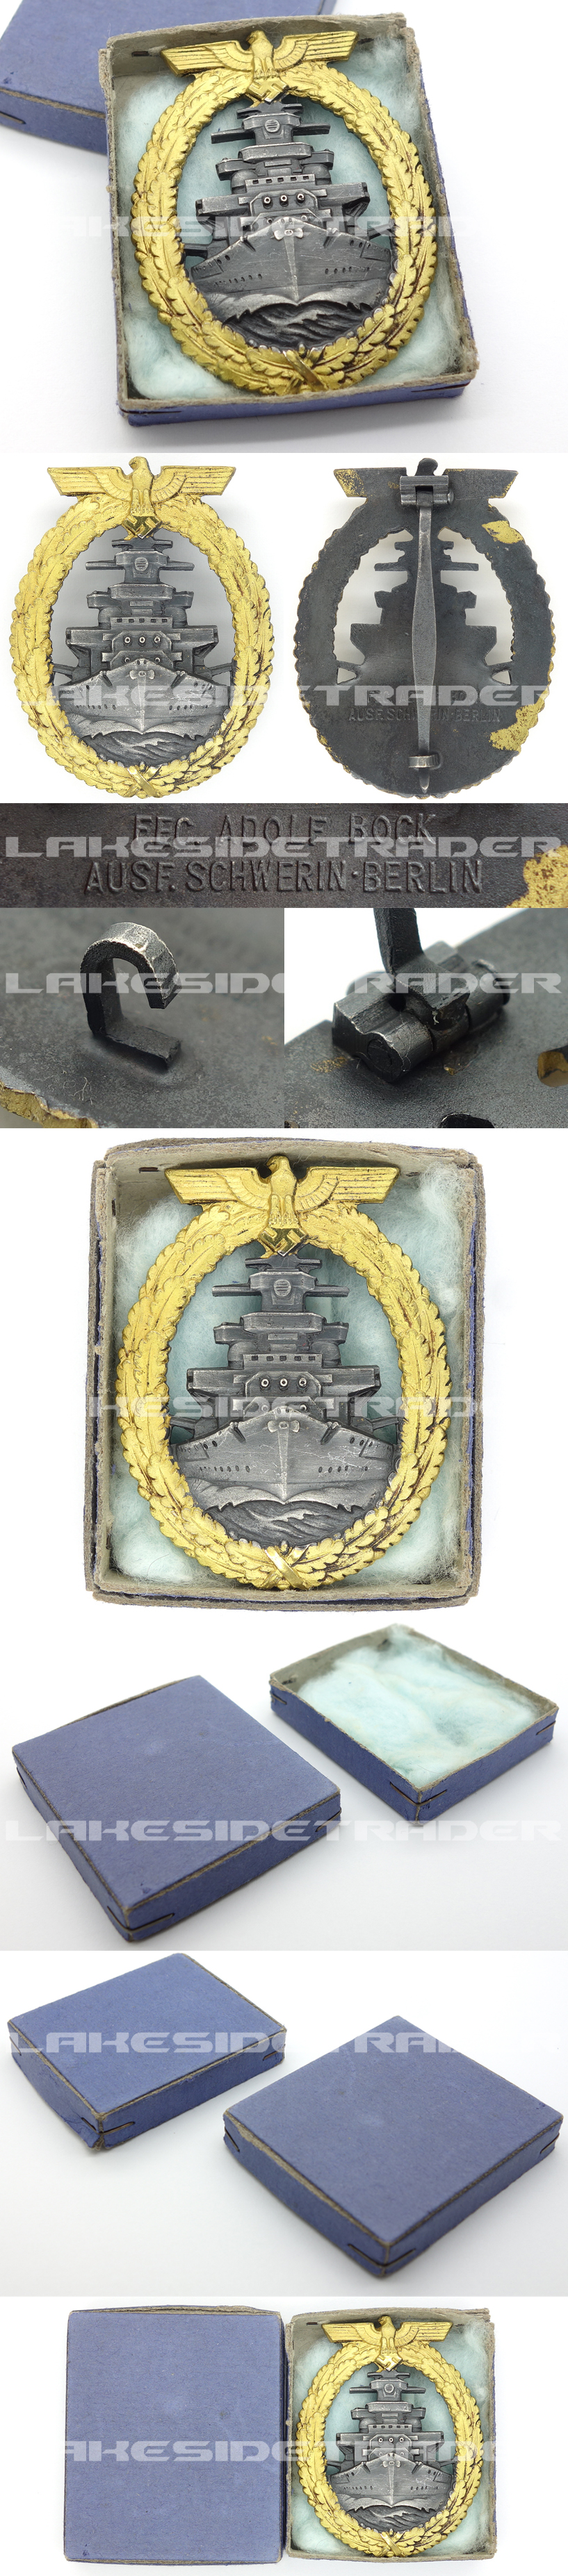 Minty – Cased High Seas Fleet Badge by Schwerin